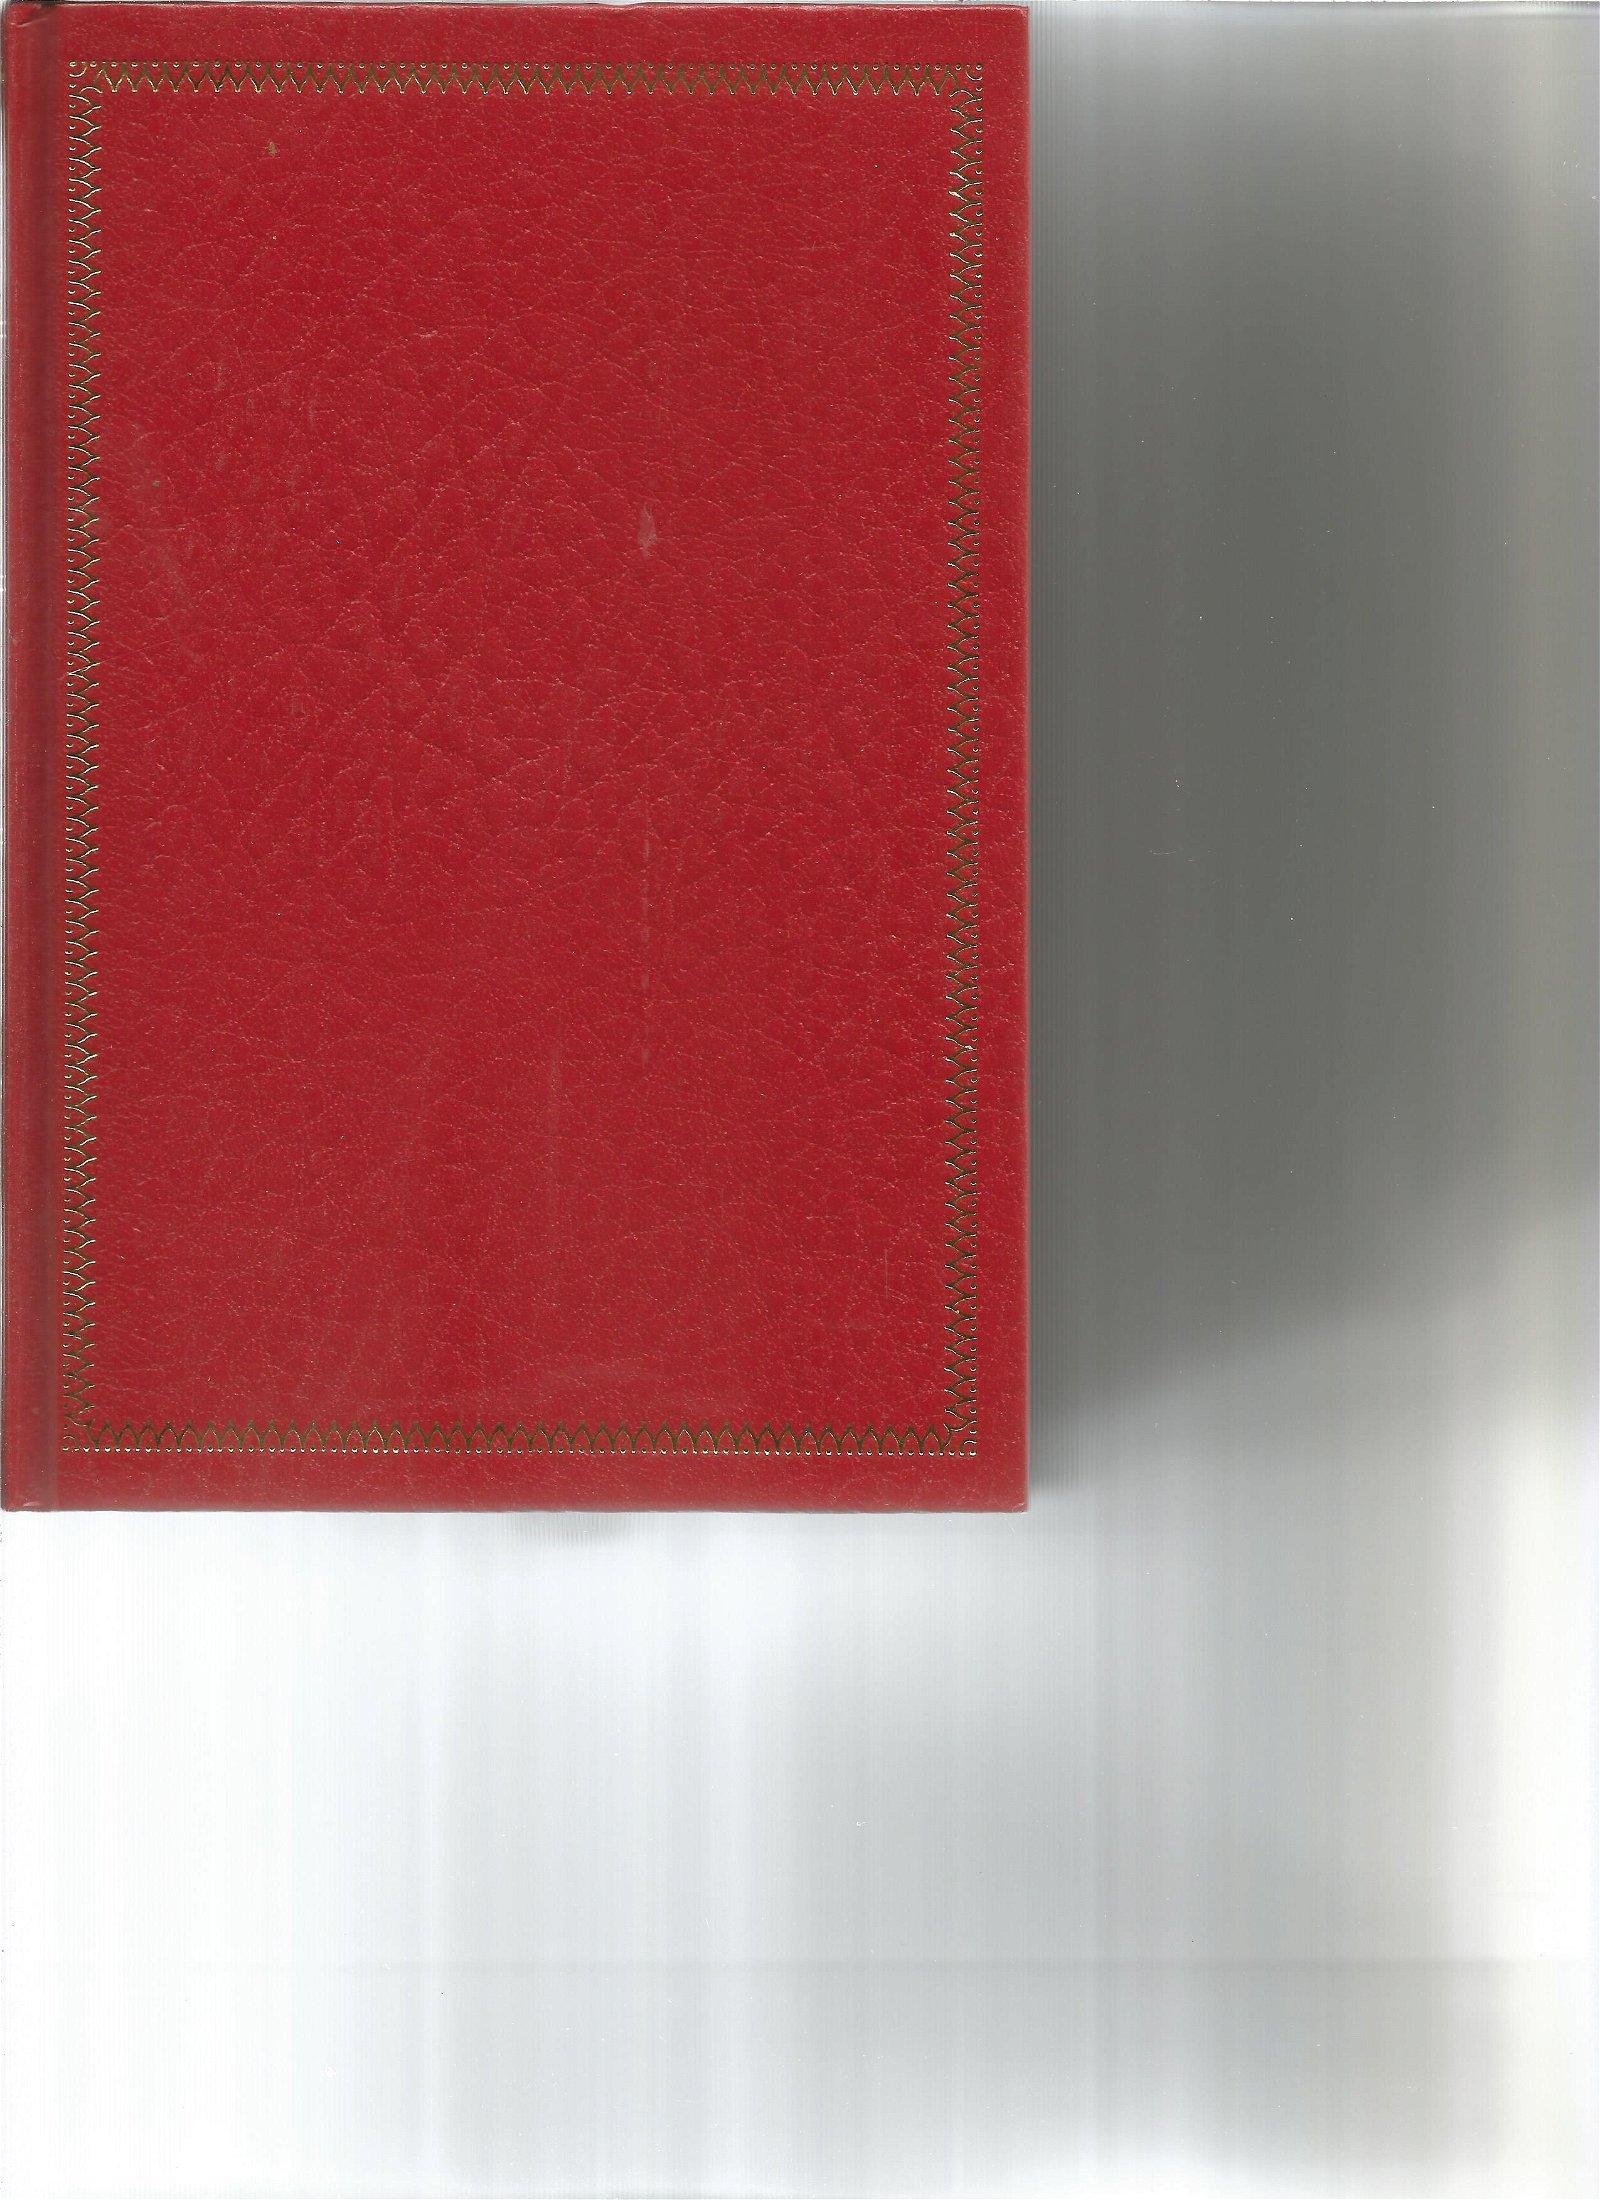 Readers Digest Condensed Books Sea Lord by Bernard